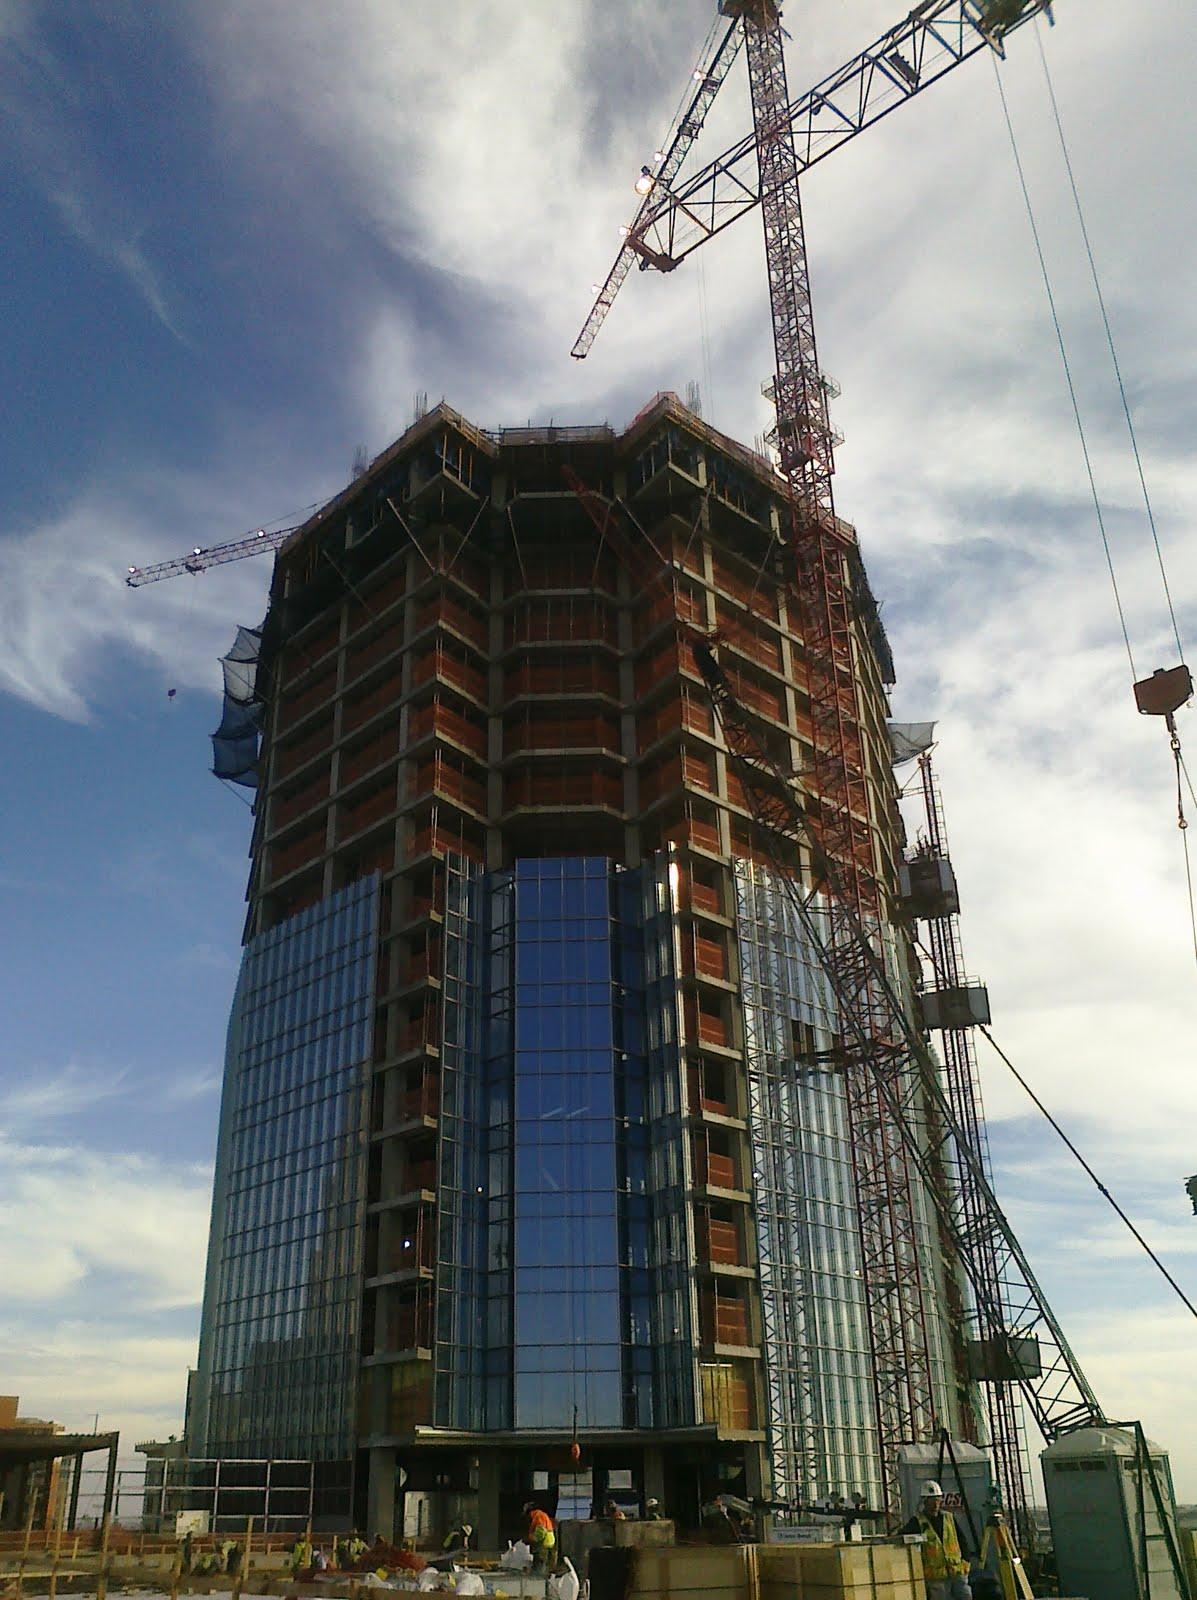 OKC Devon Tower Construction Construction Progress of Devon Tower 12092010